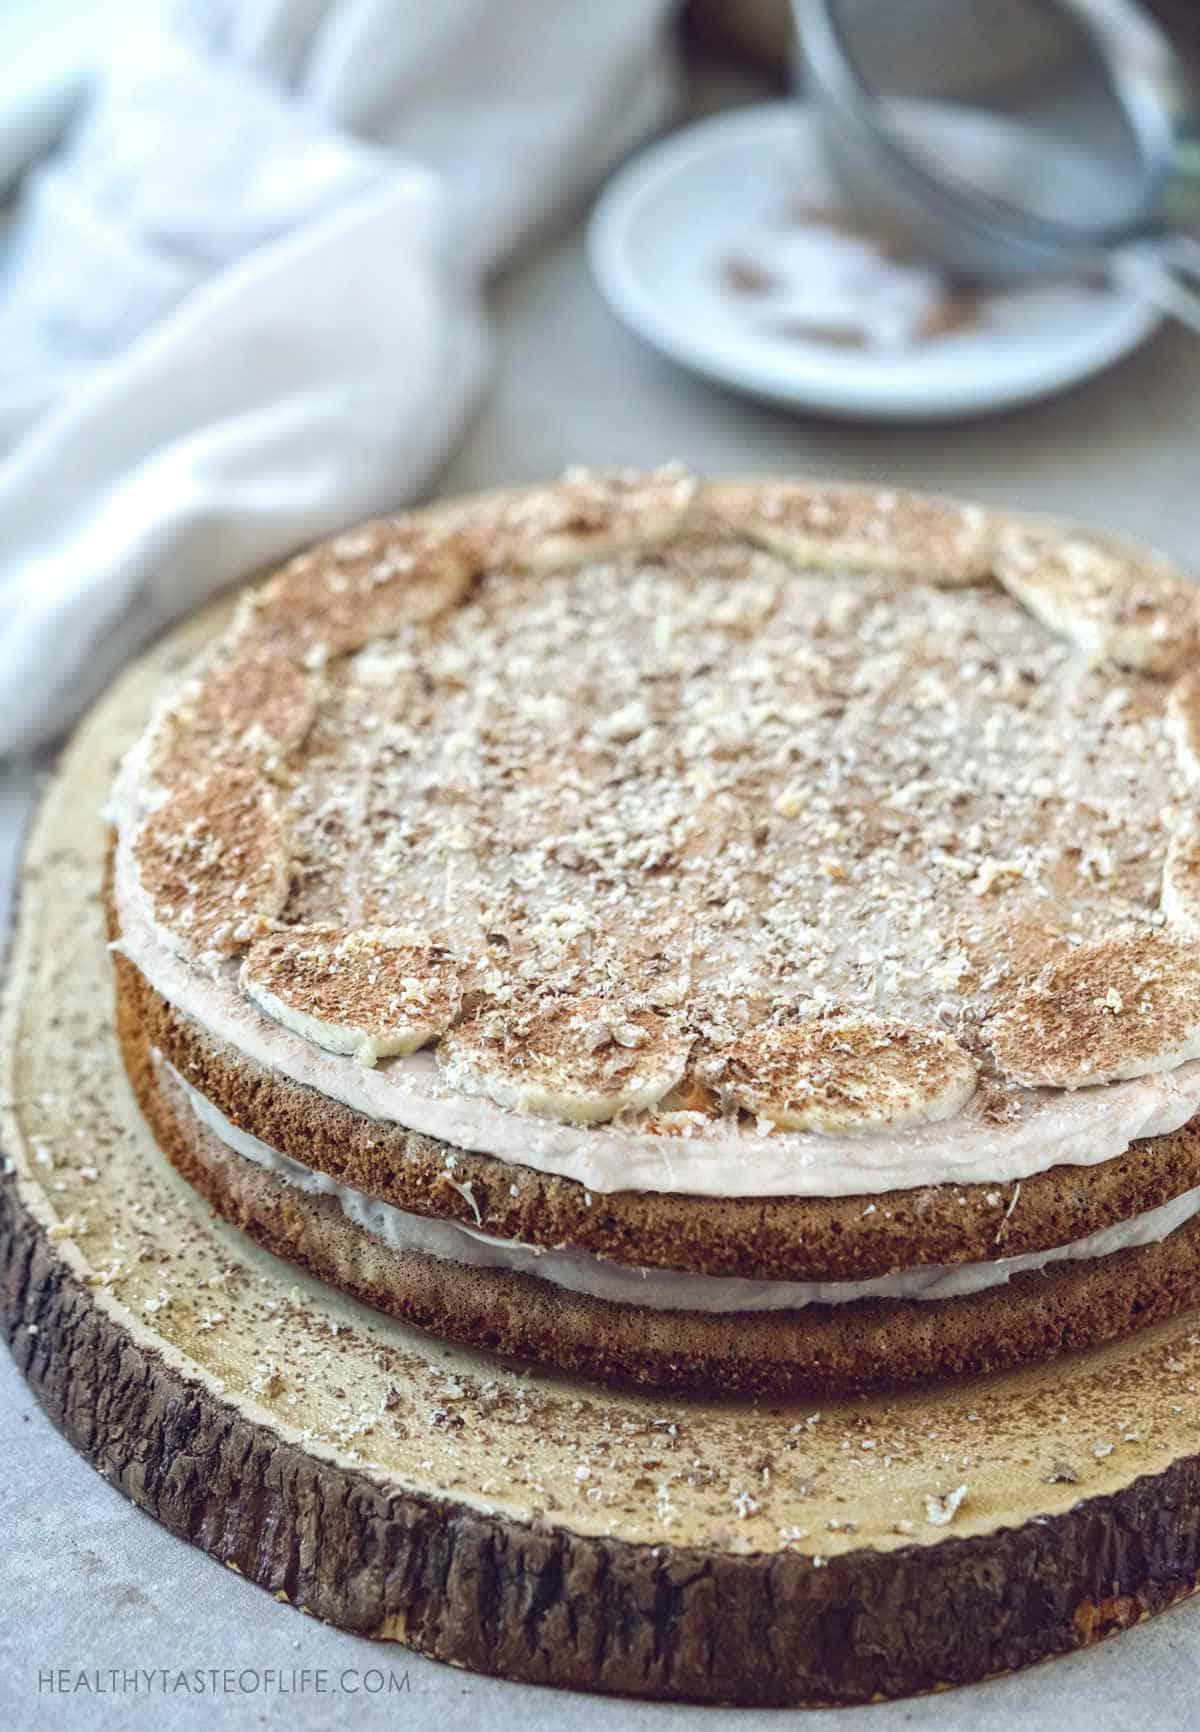 Gluten free banana cake recipe - gluten and dairy free banana care with healthy ingredients #glutenfreebananacake